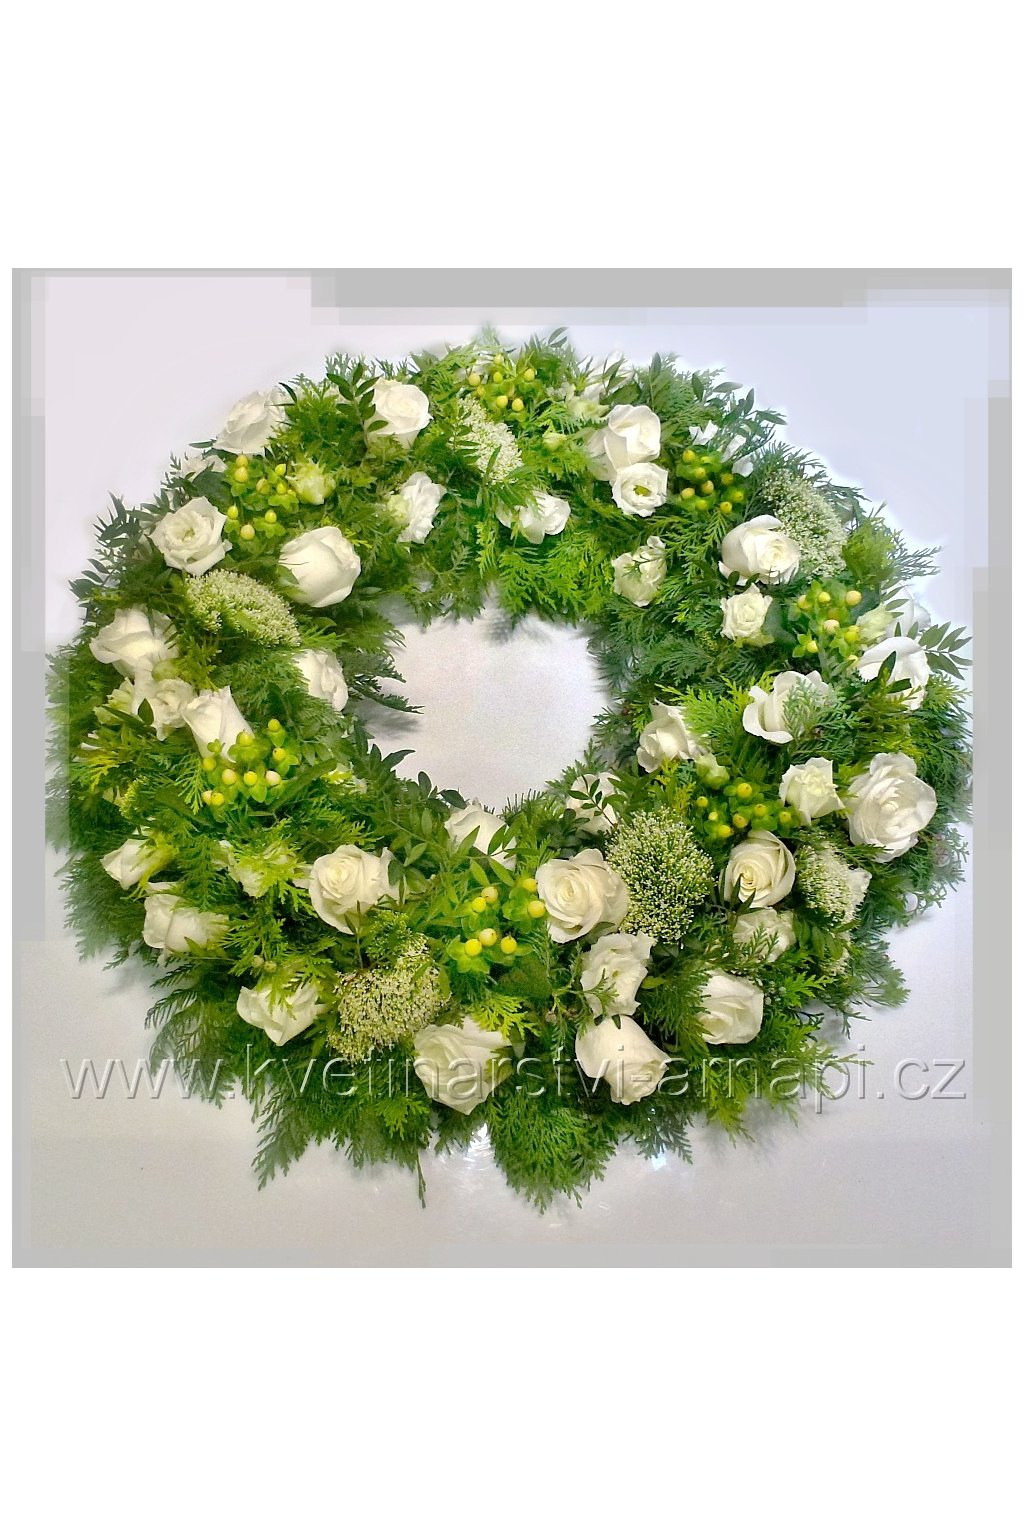 smutecni venec kvetinarstvi arnapi